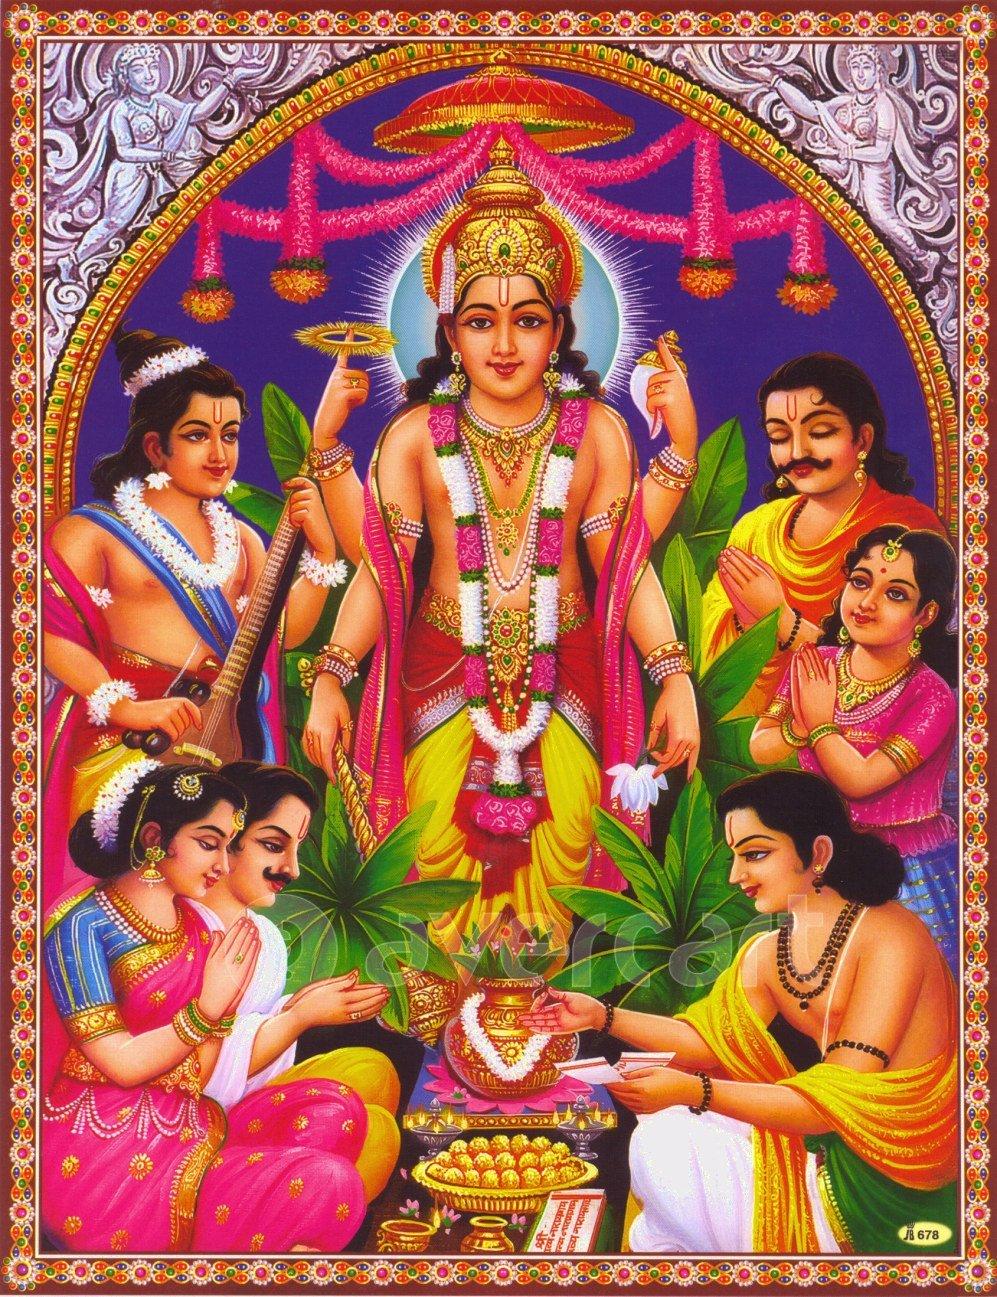 Sri Venkateswara Swamy Hd Wallpapers Lord Satyanarayan Satyanarayana Swamy Hd Incredible